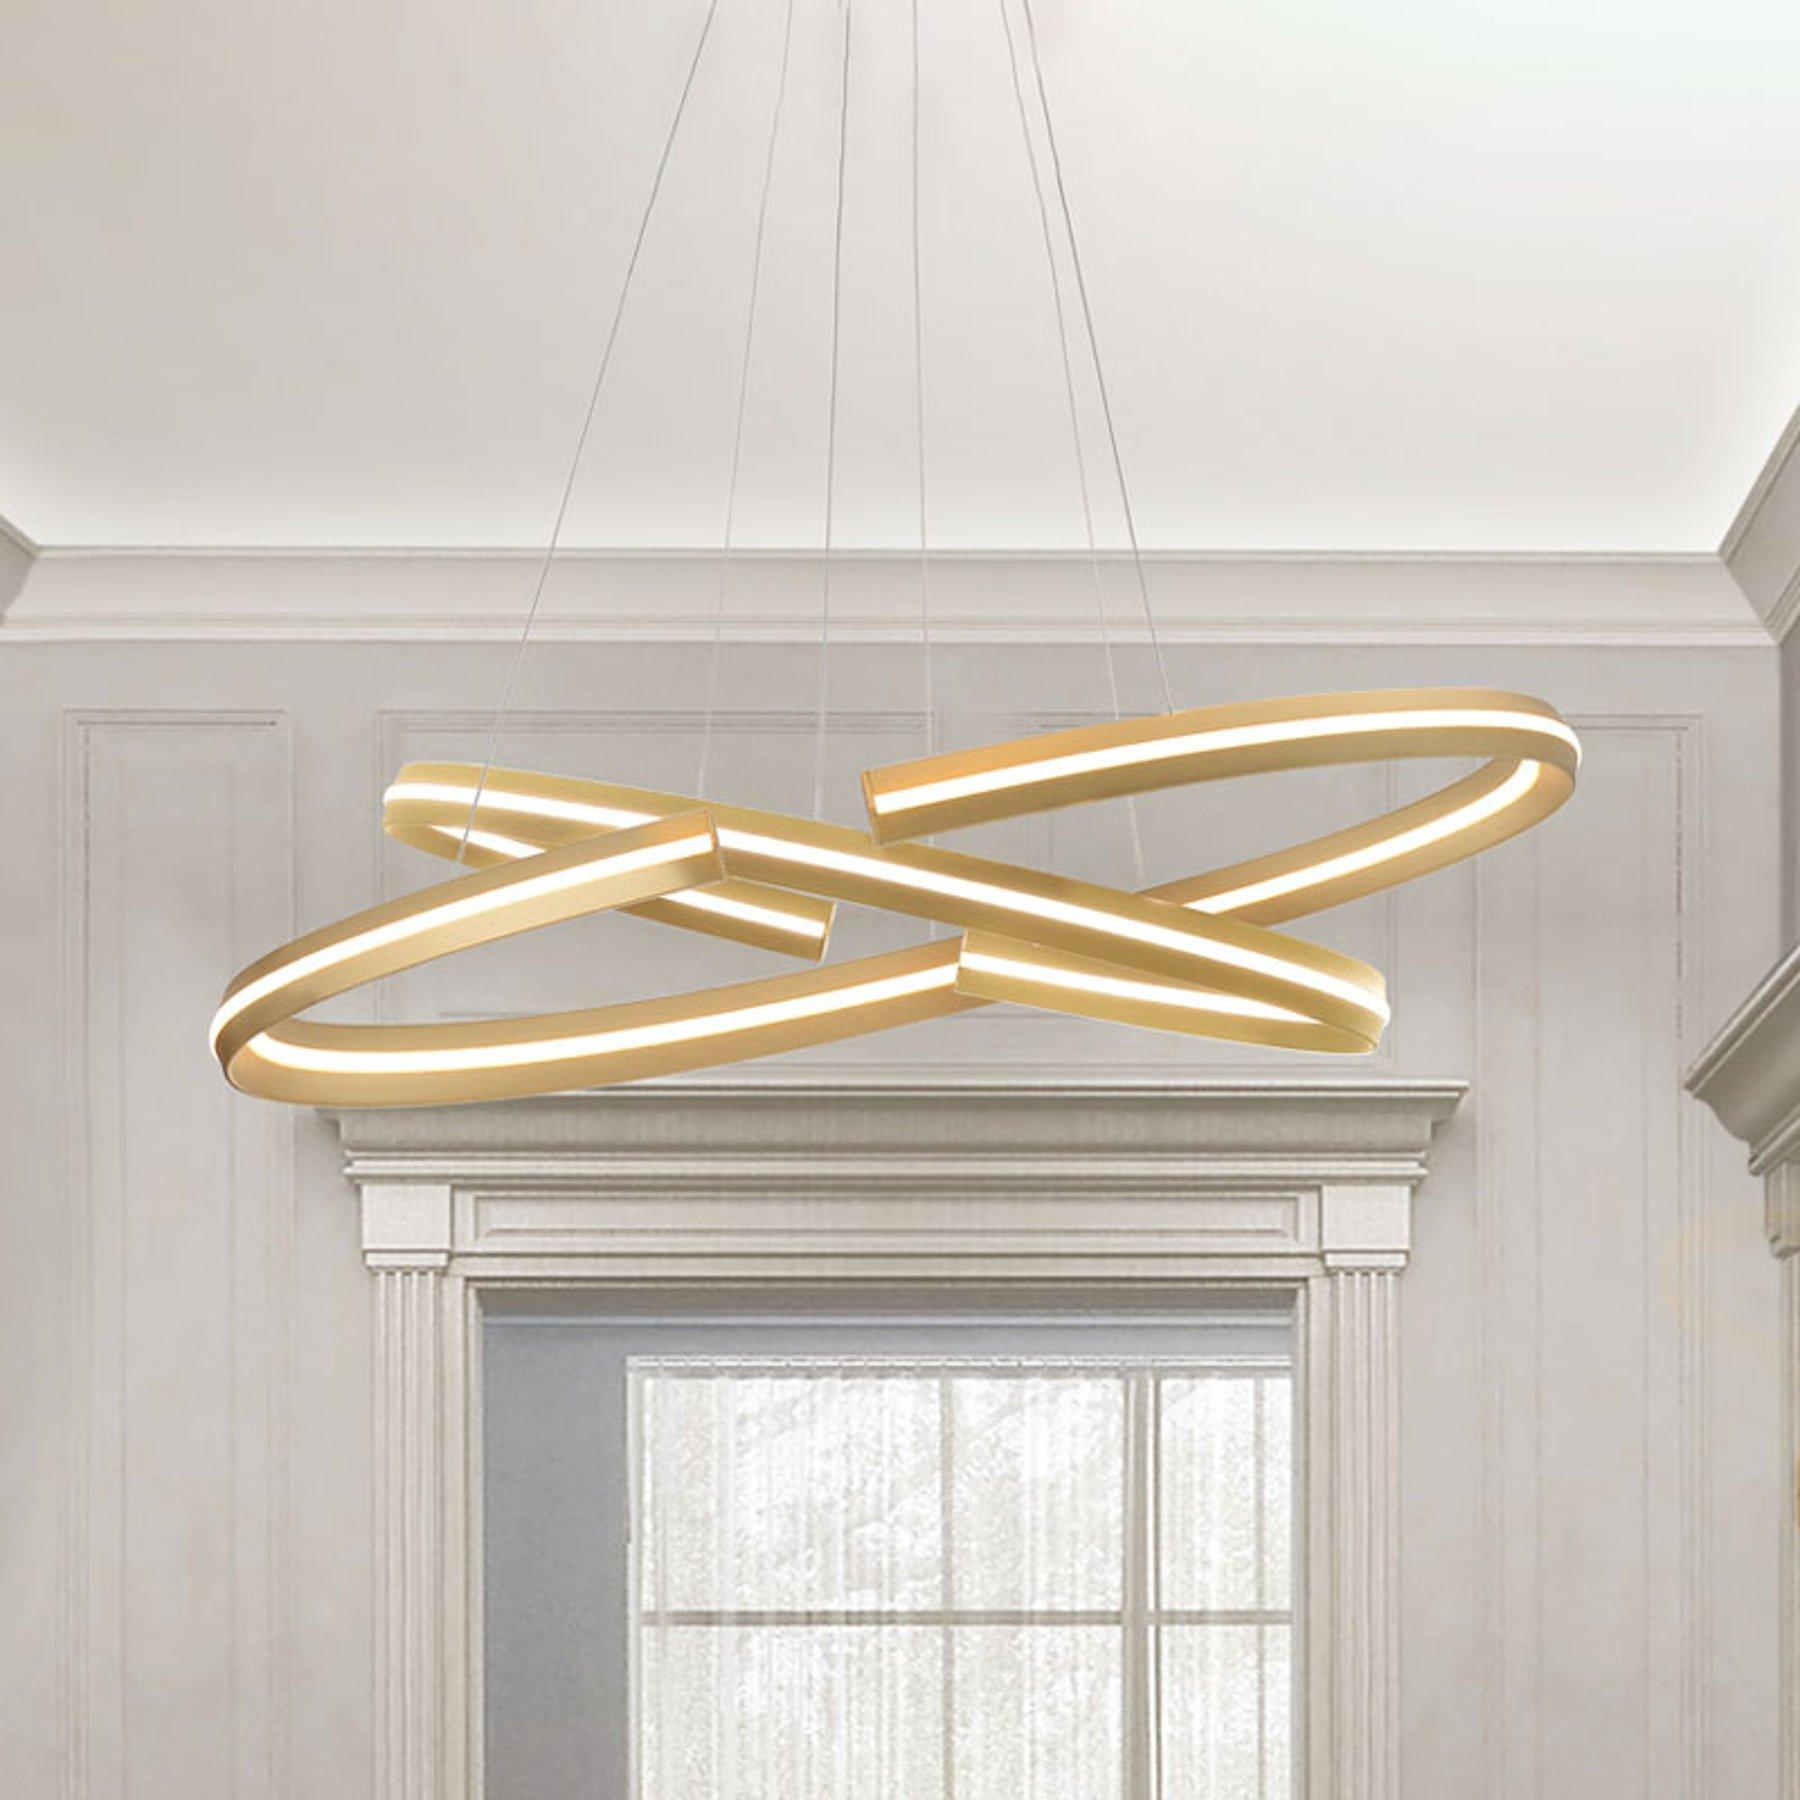 LED-hengelampe Elipse i oval form, 80x40 cm